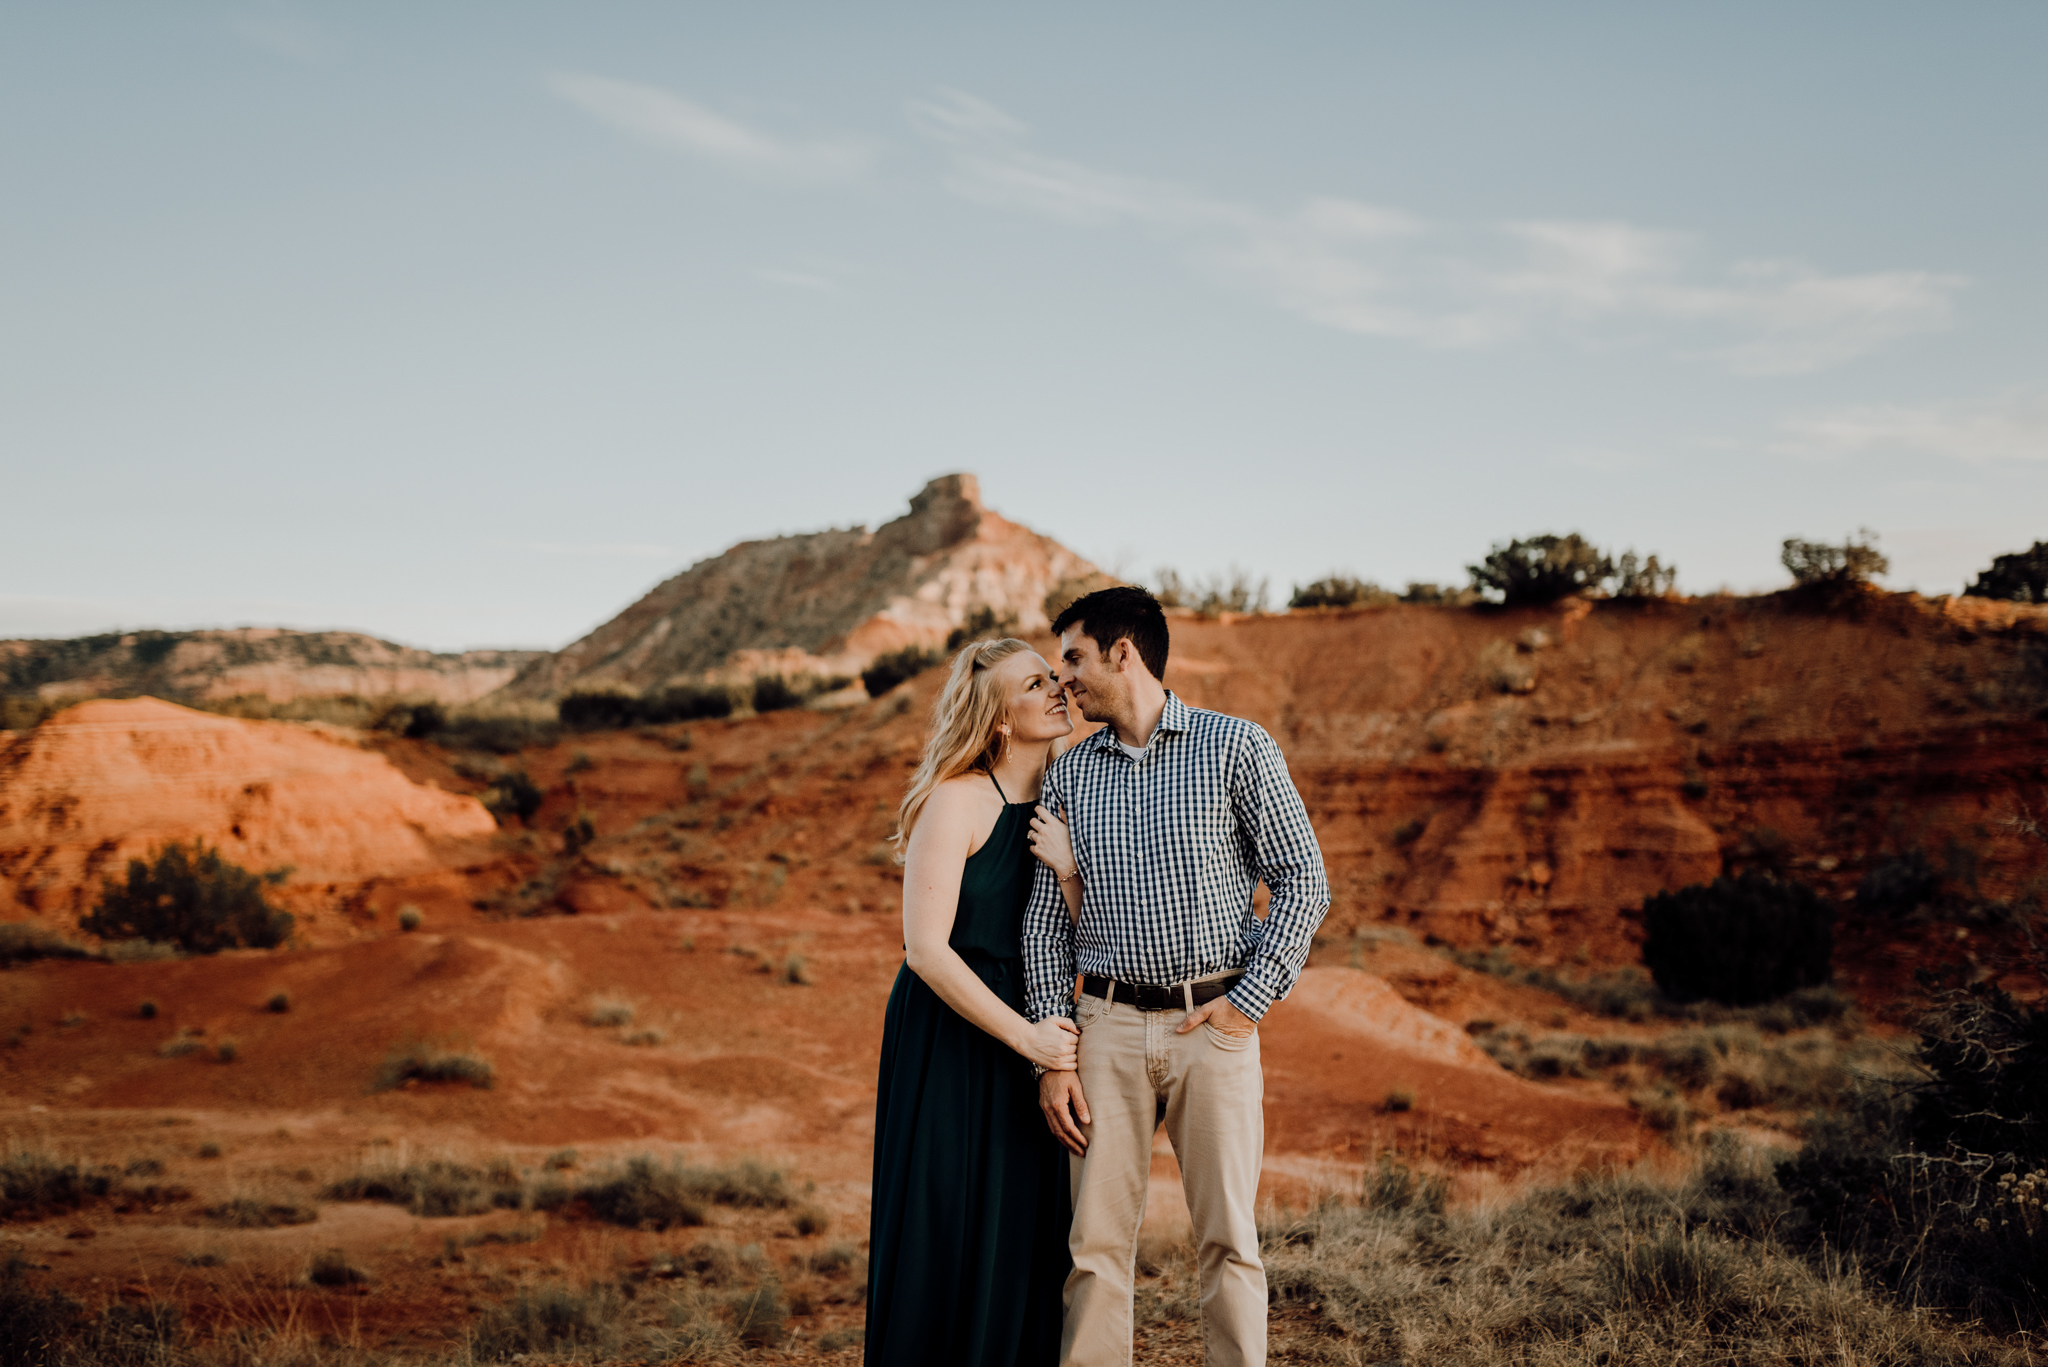 Houston Wedding Photographer-Palo Duro Canyon Engagement Session- Houston Wedding Photographer -Kristen Giles Photography-19.jpg